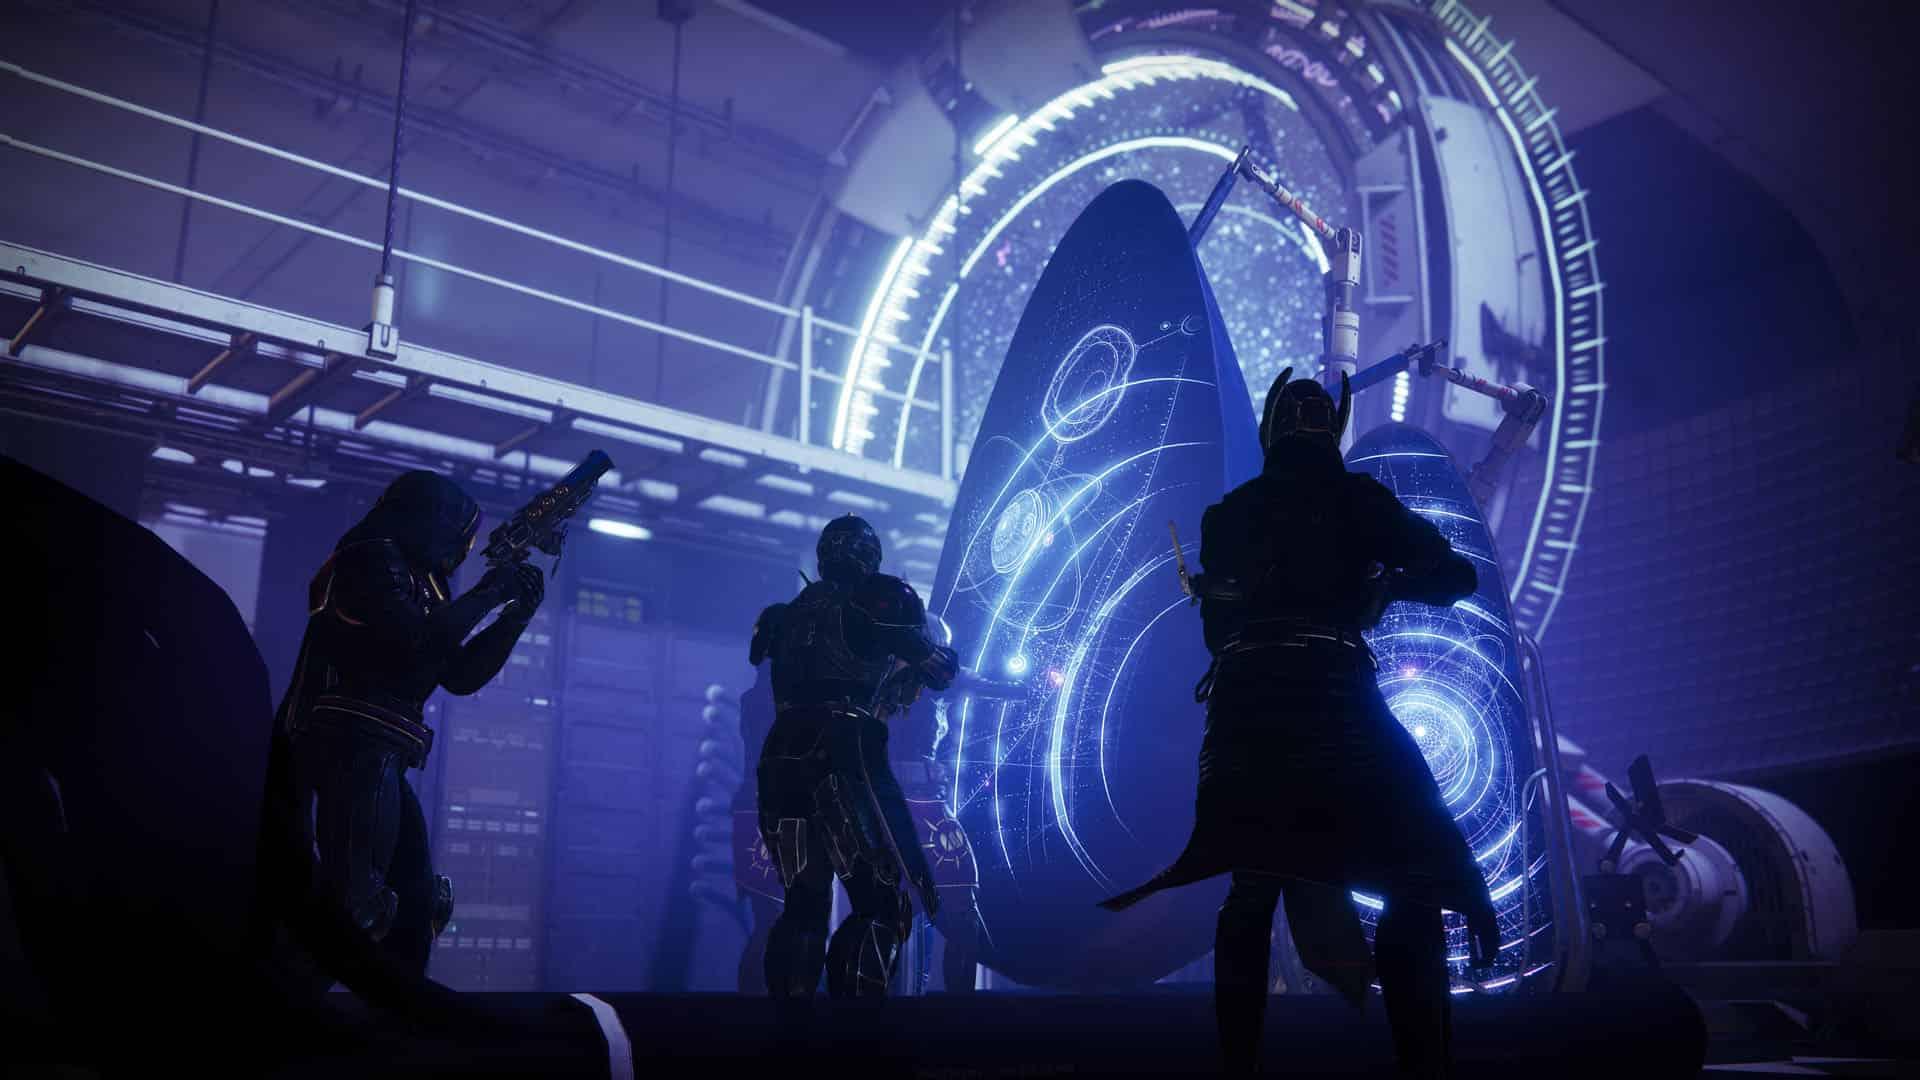 destiny-2-all-emblems-and-how-to-get-them-2021